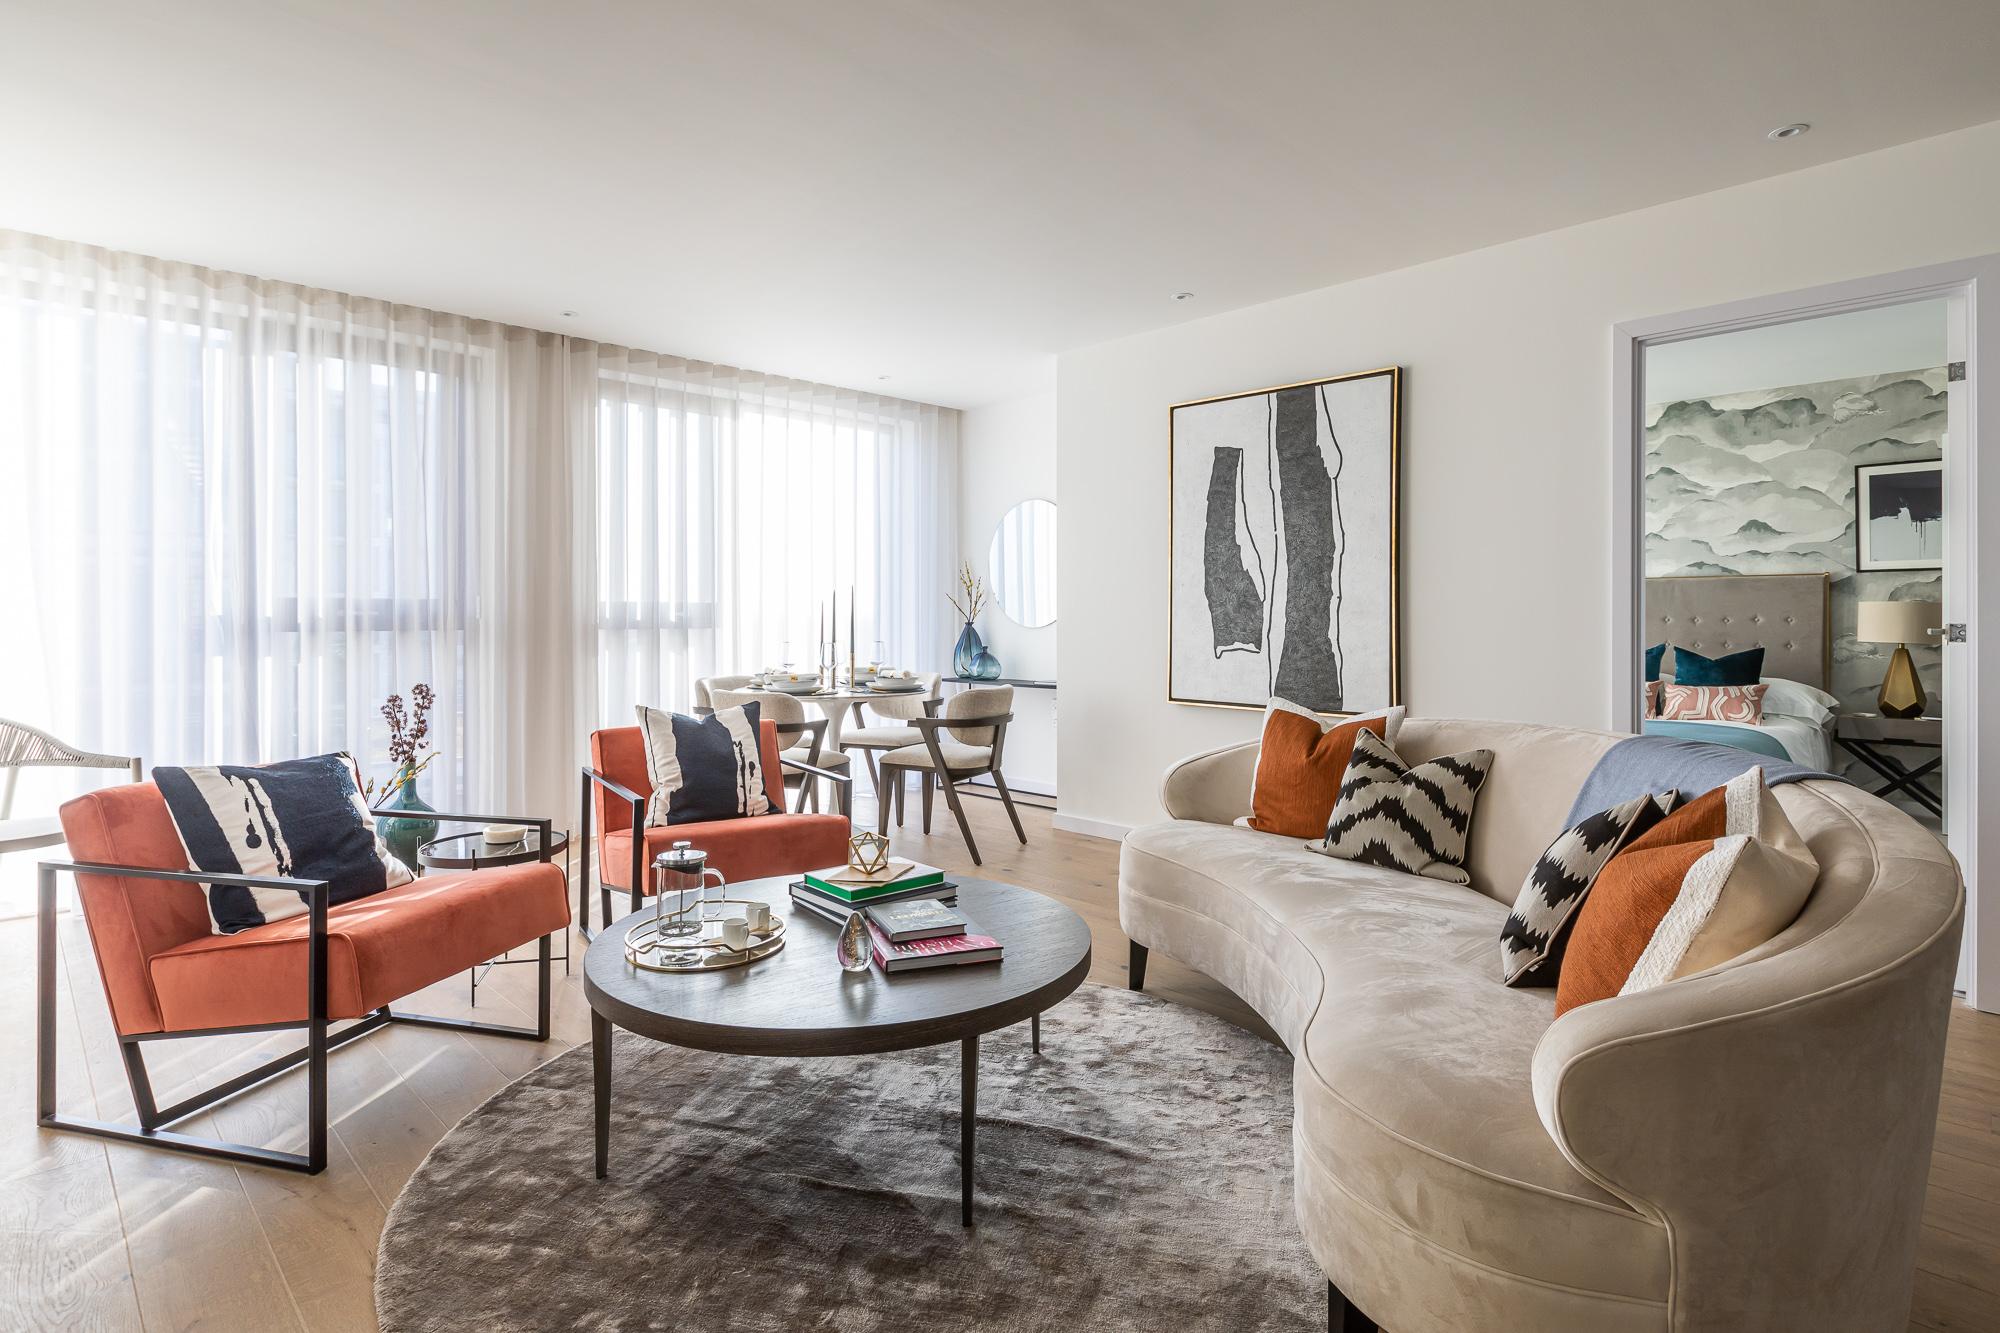 jonathan bond, interior photographer, round coffee table & sofas in living room, putney london